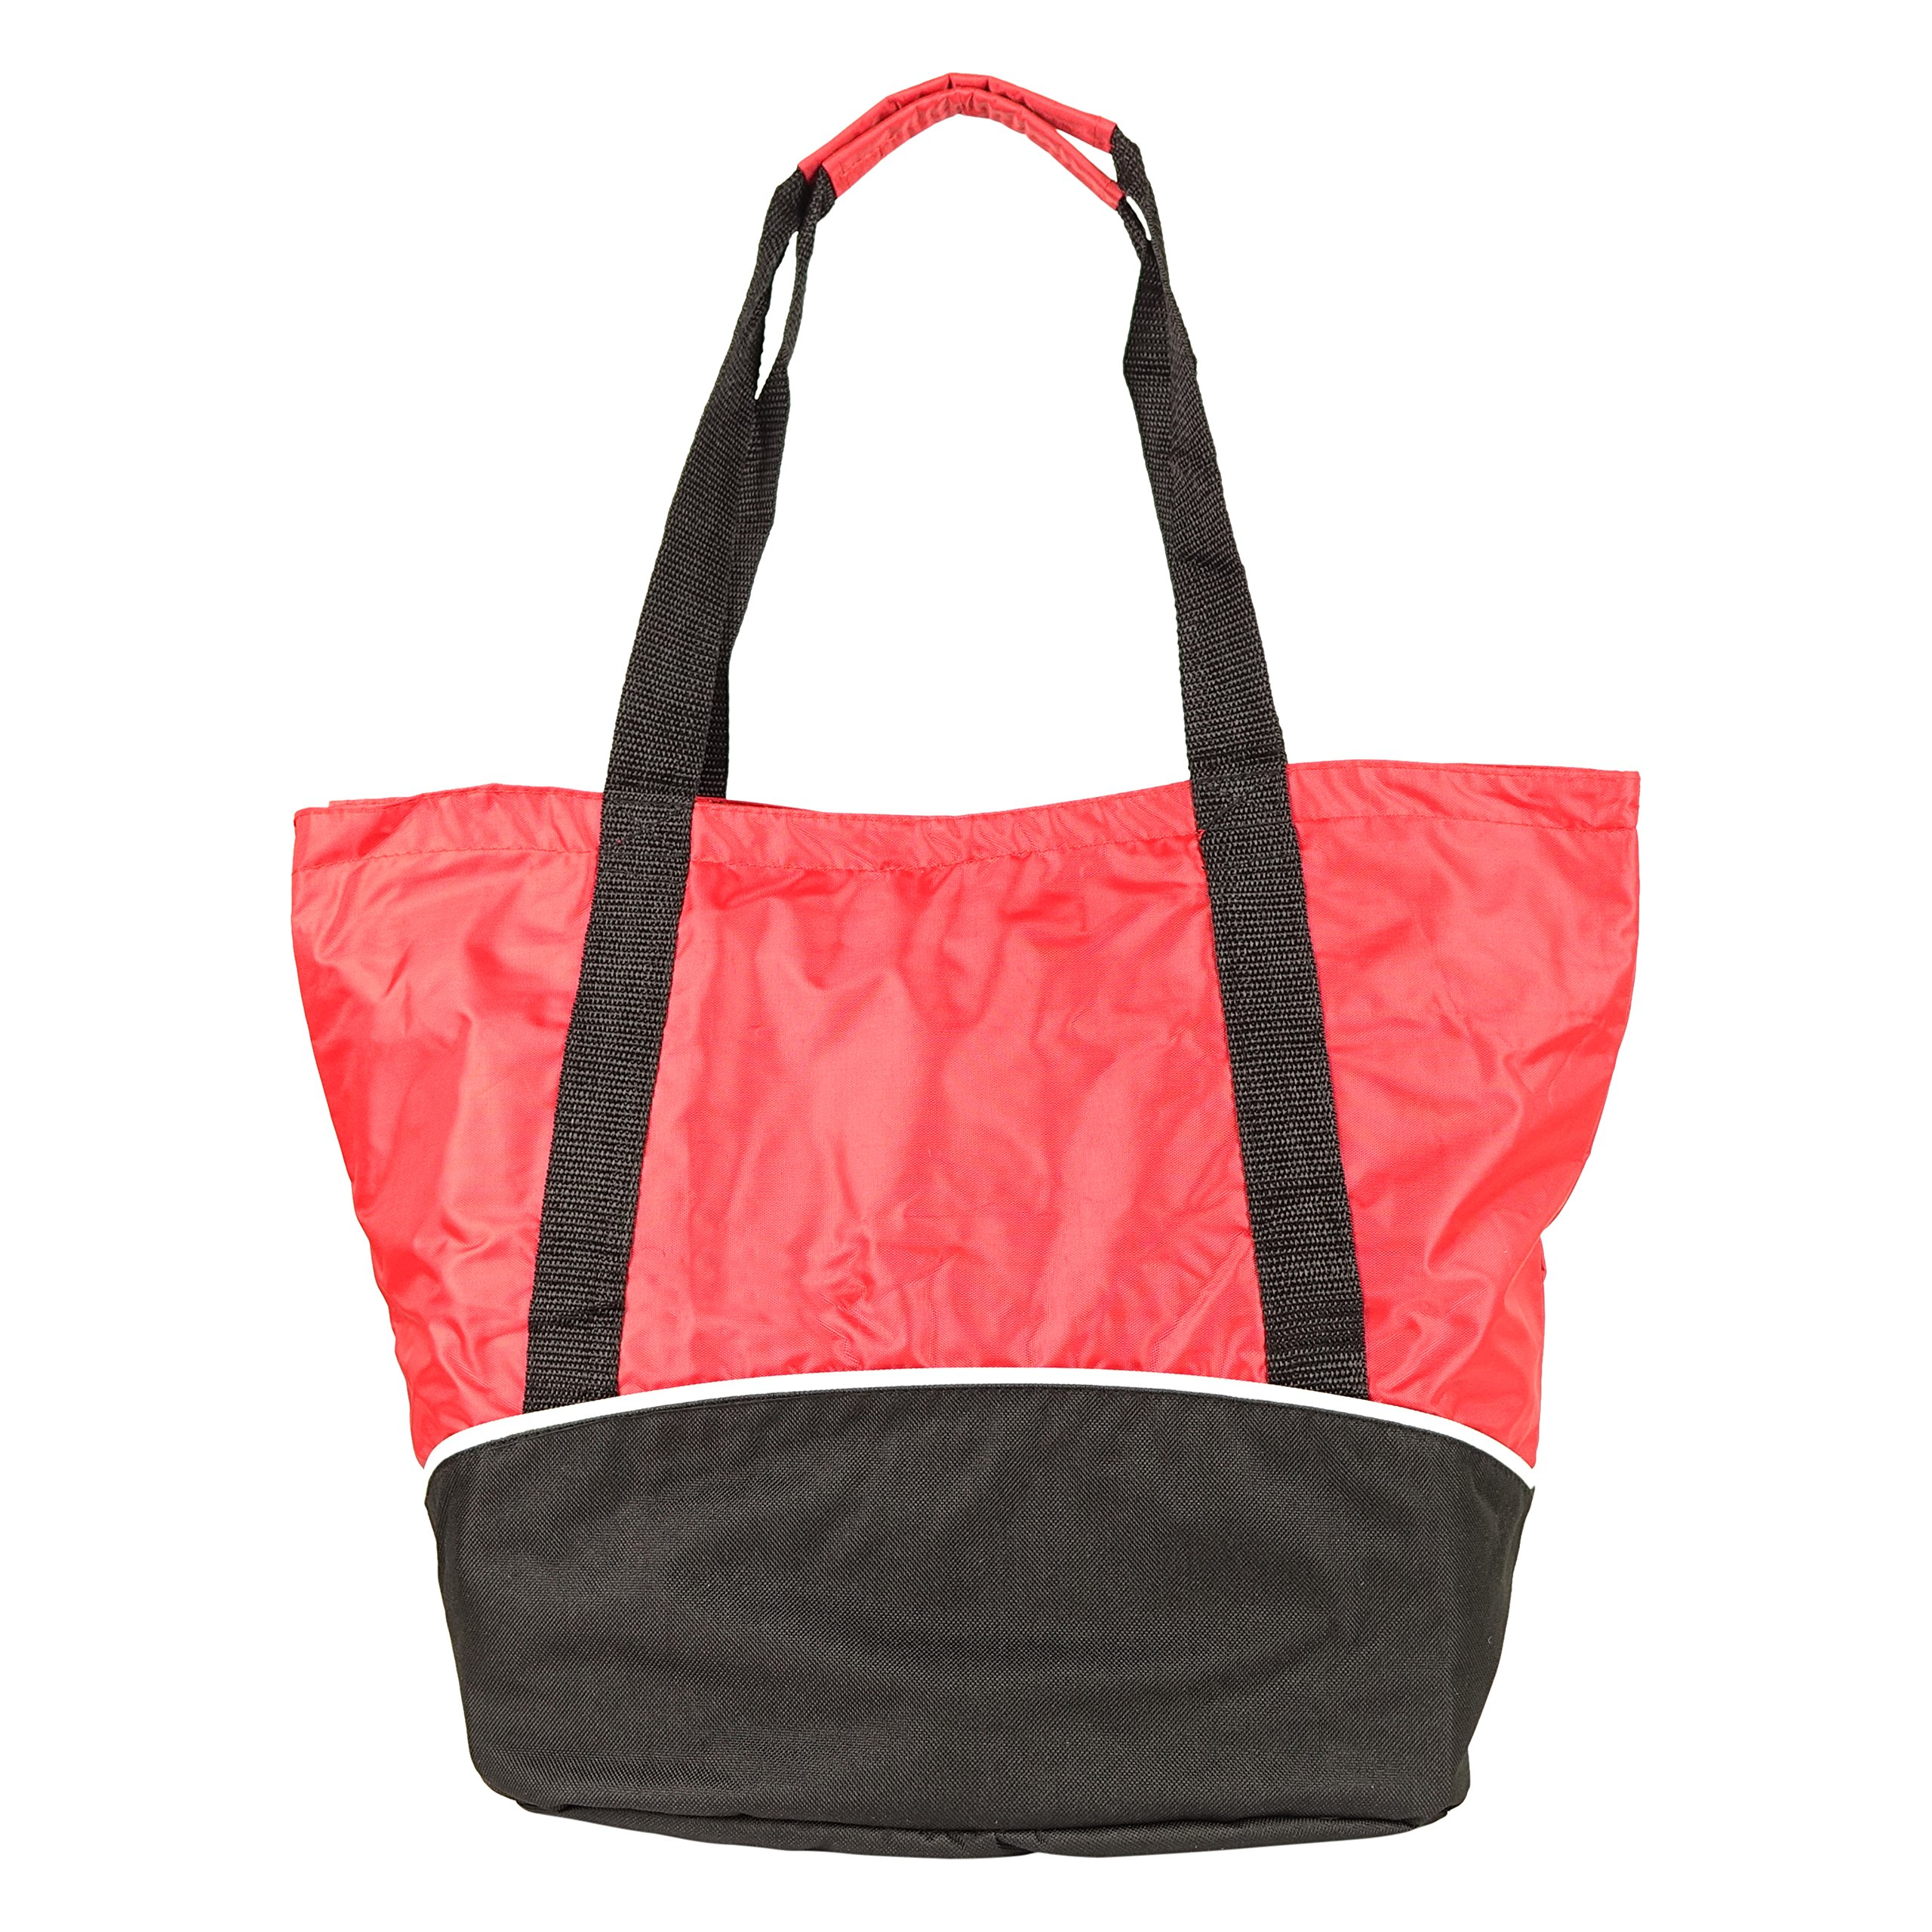 NuFazes 18'' x 14'' Fashionable Polyester/Nylon Shopping Bag (Tote) - 48 Pack